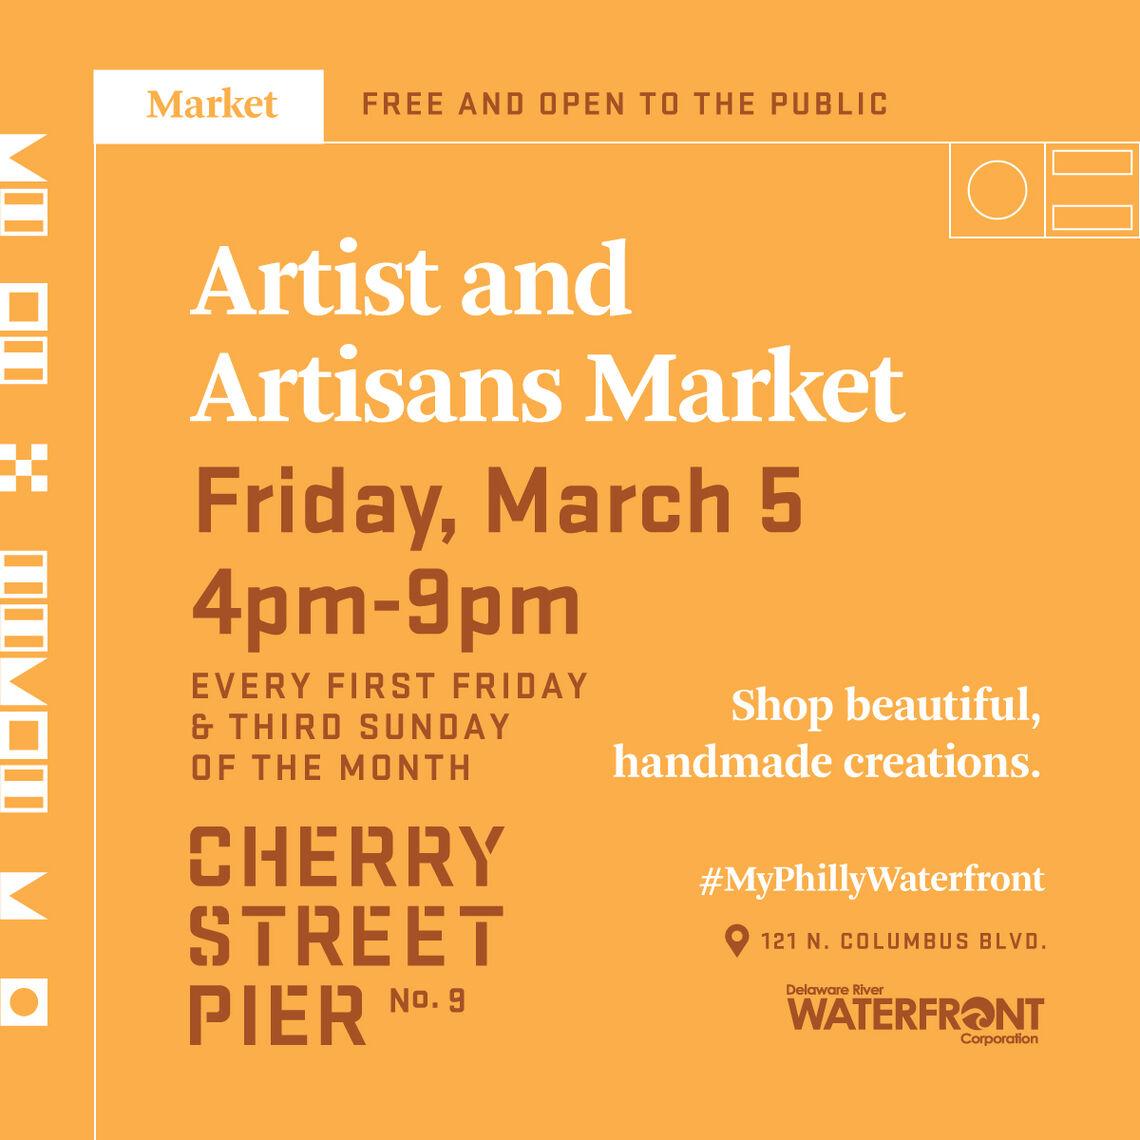 artist and artisans market 2021 03 05 social 2